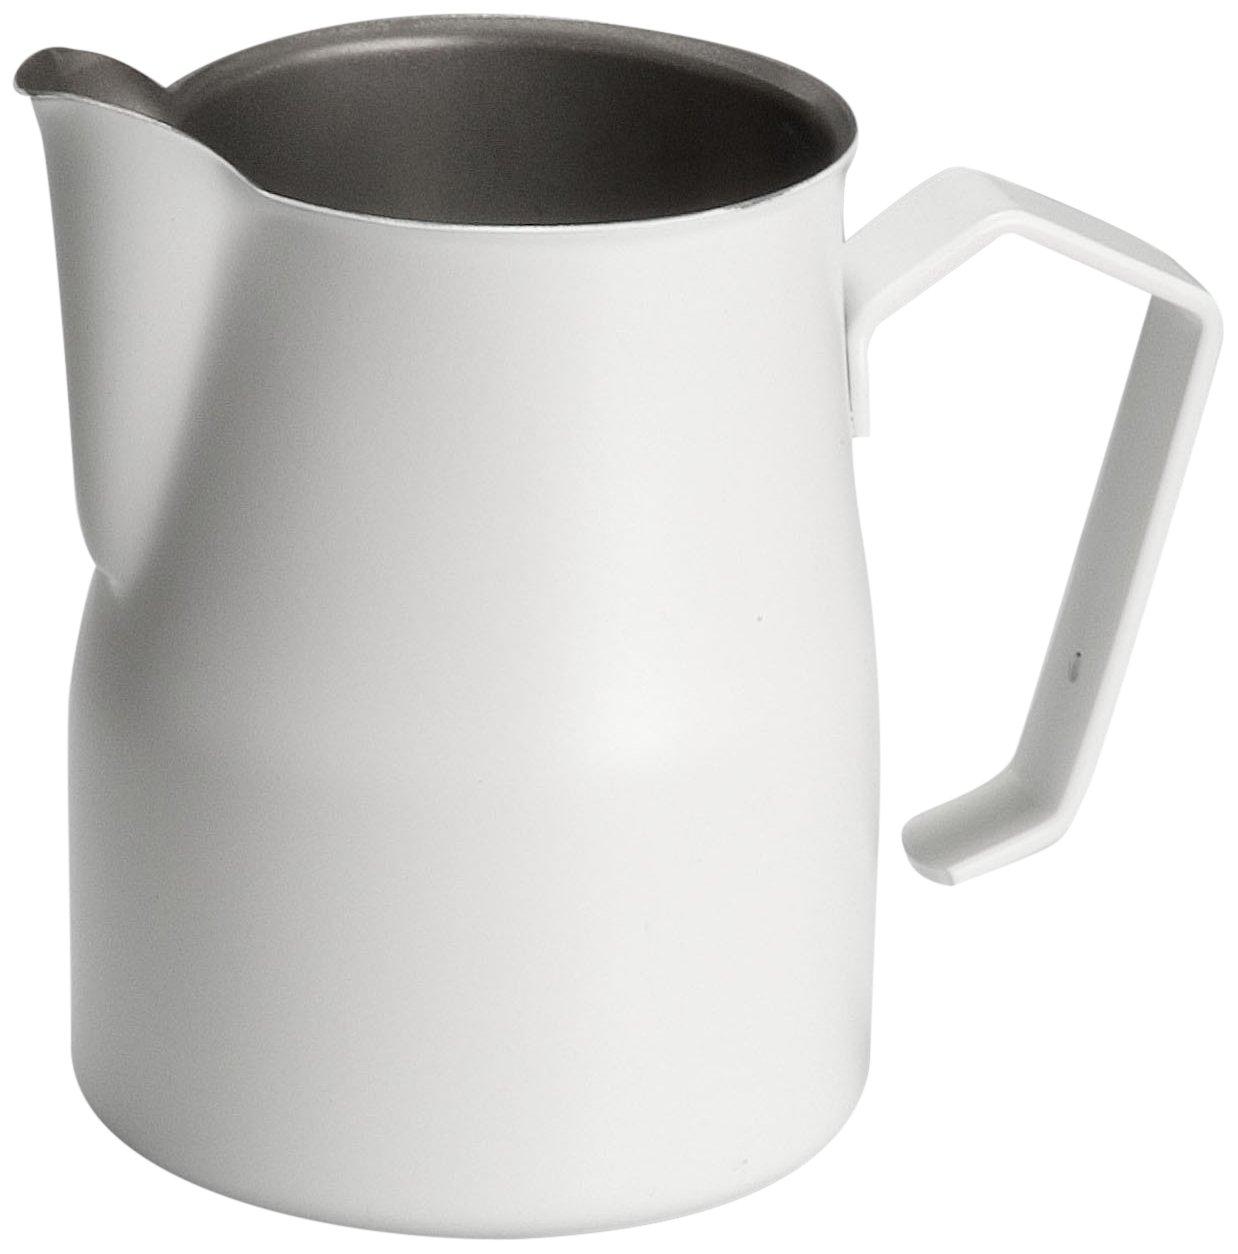 Motta Stainless Steel Professional Milk Pitcher/Jugs, 11.8 Fluid Ounce, White by Metallurgica Motta